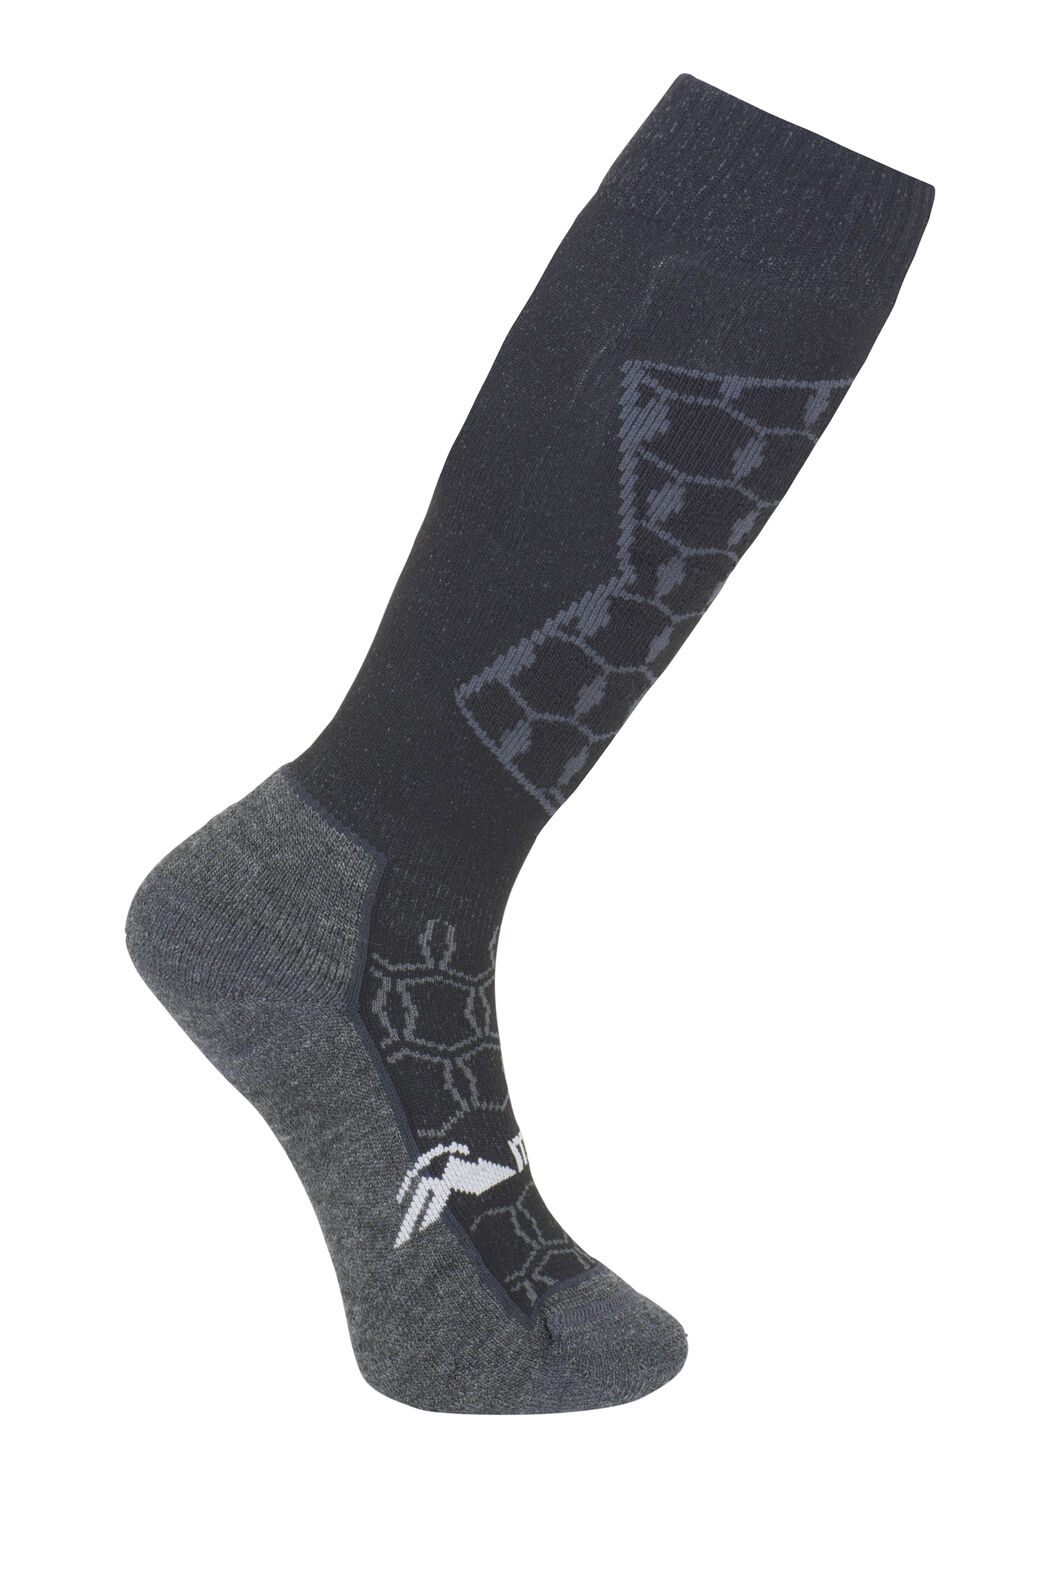 Macpac Kids' Tech Ski Sock, Black/Charcoal, hi-res